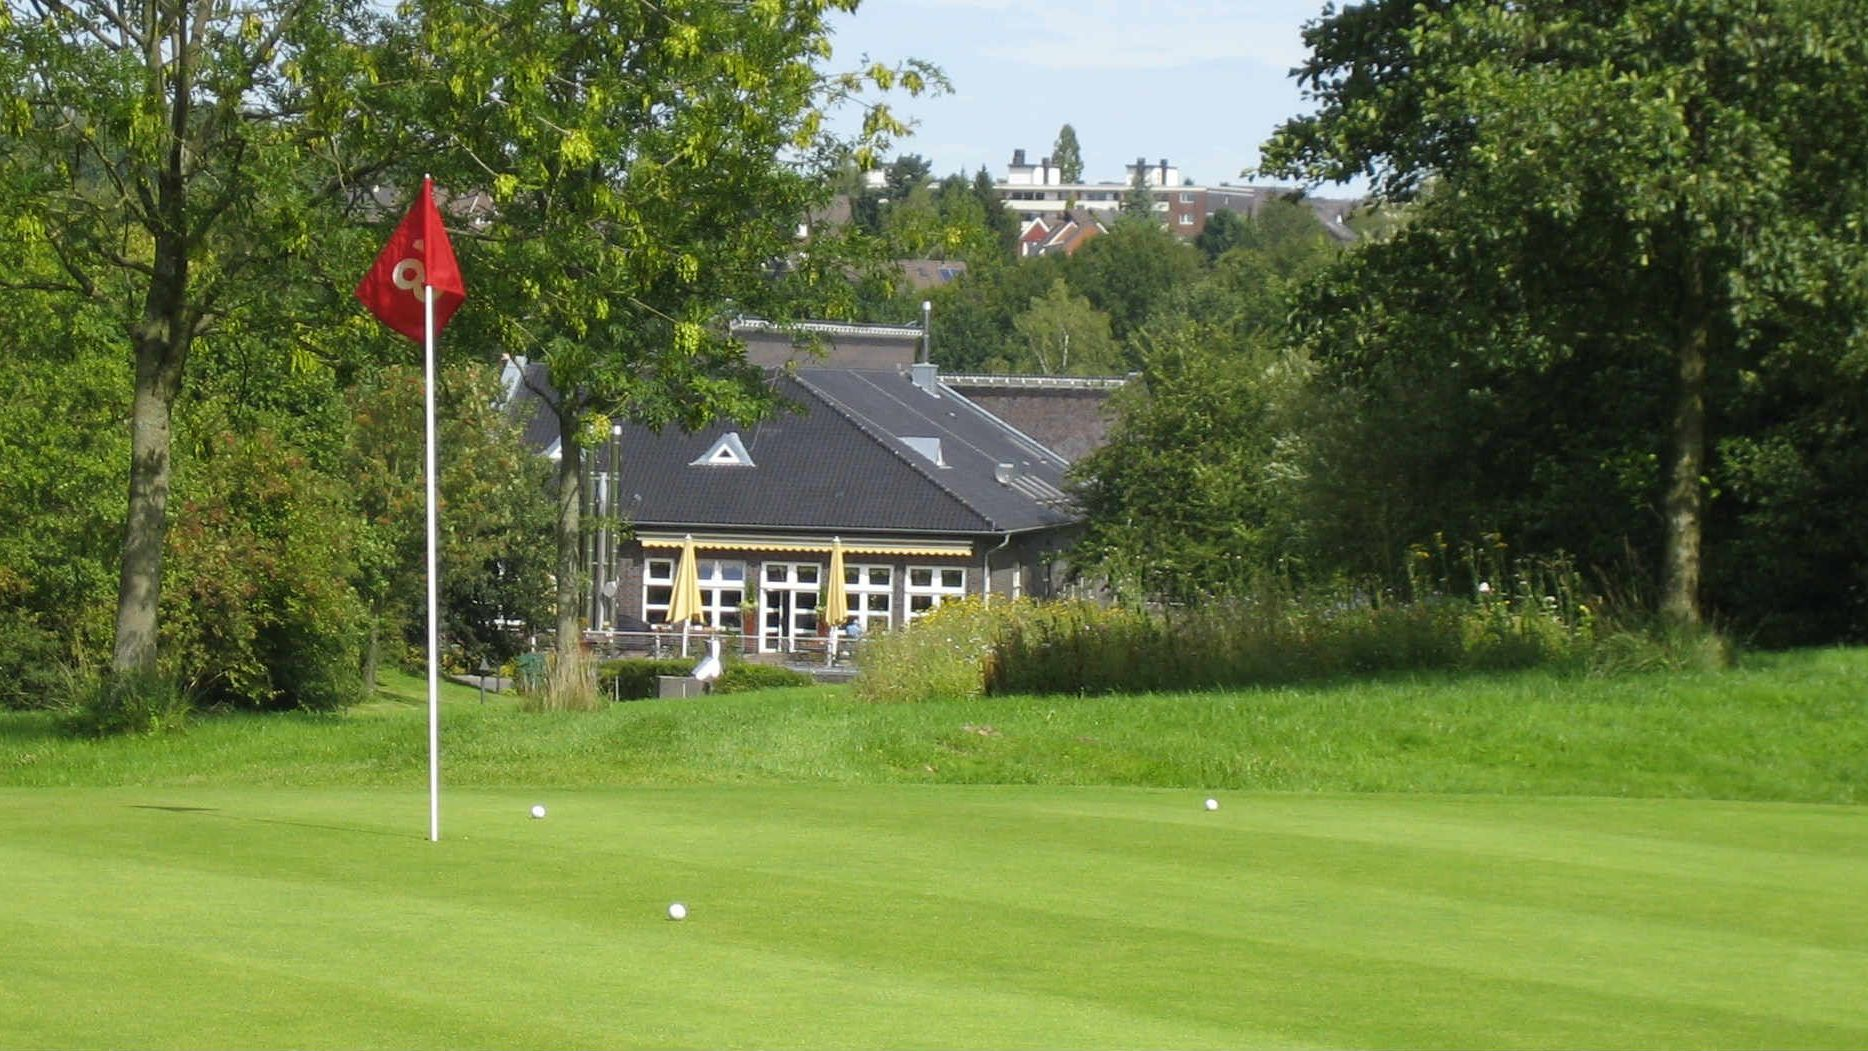 Golfplatz in Ratingen-Homberg